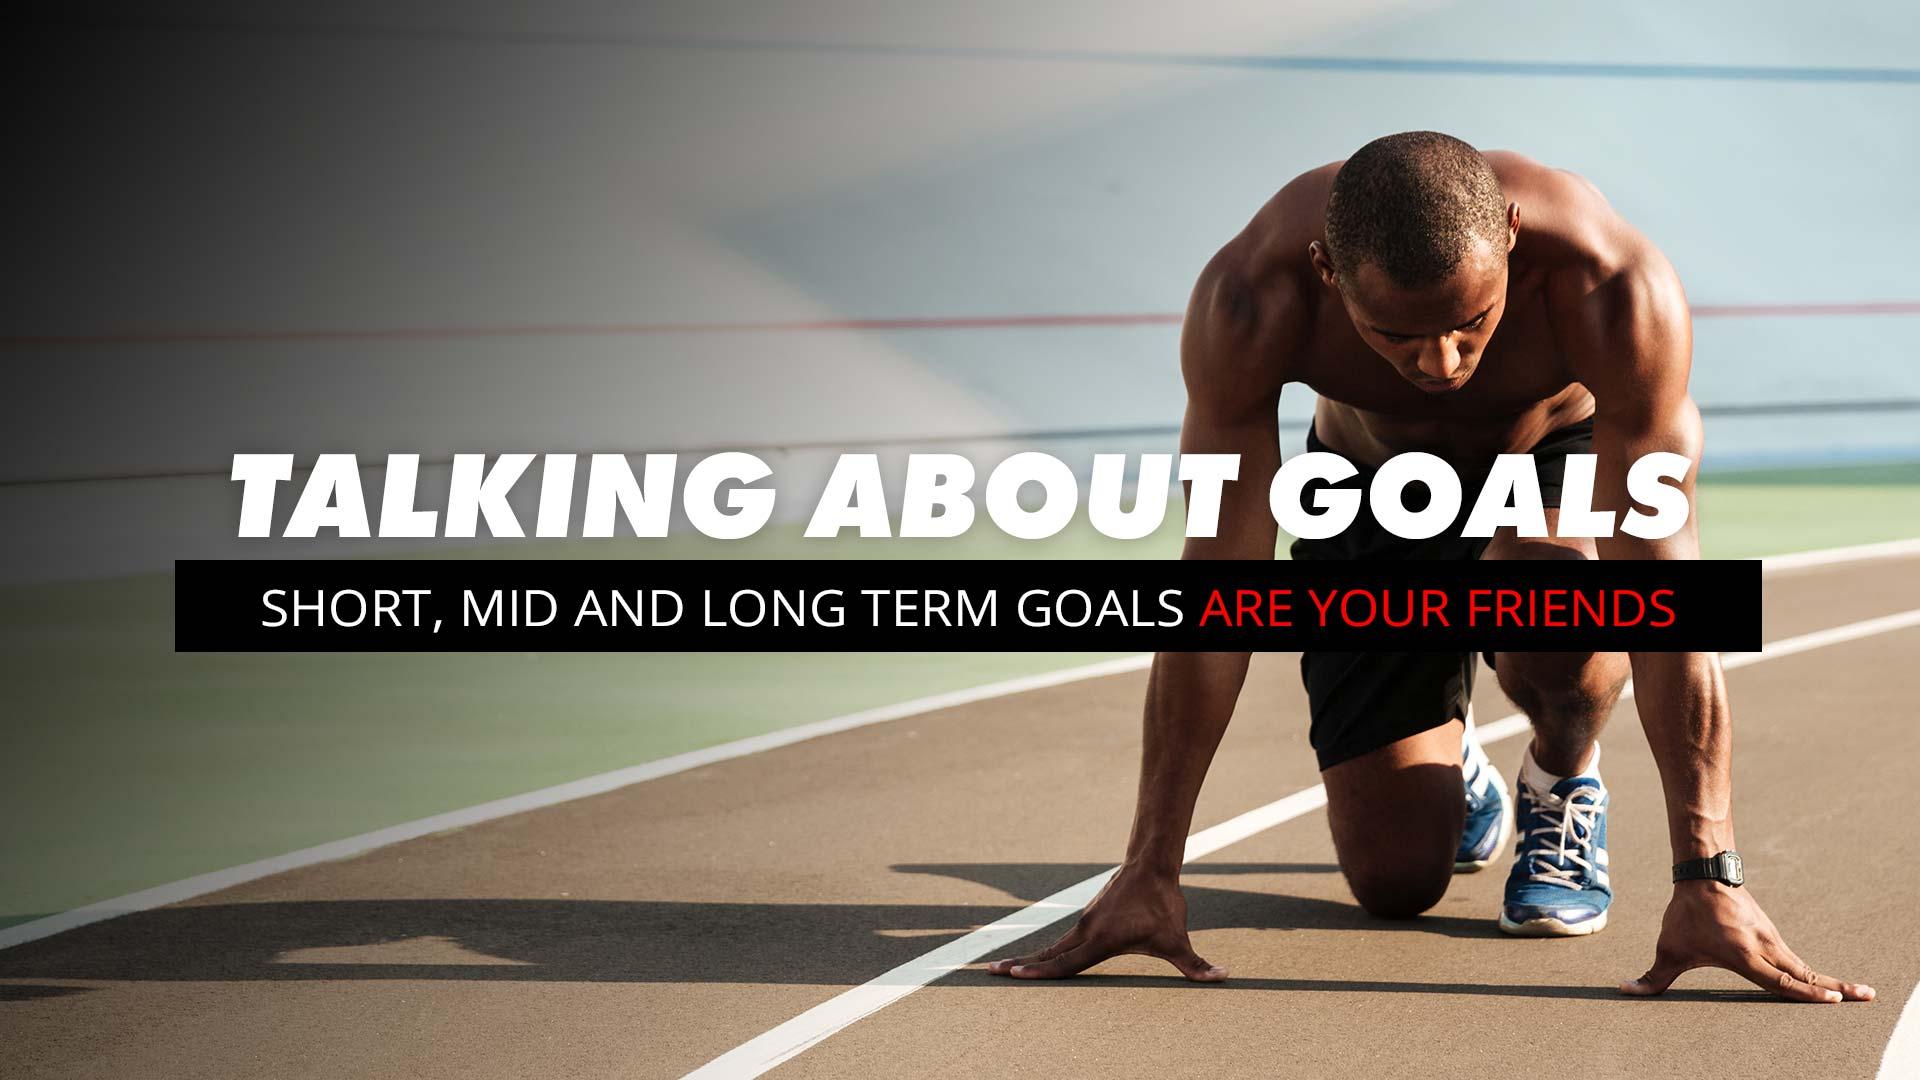 ae-short-mid-long-term-goals-post-hero-2